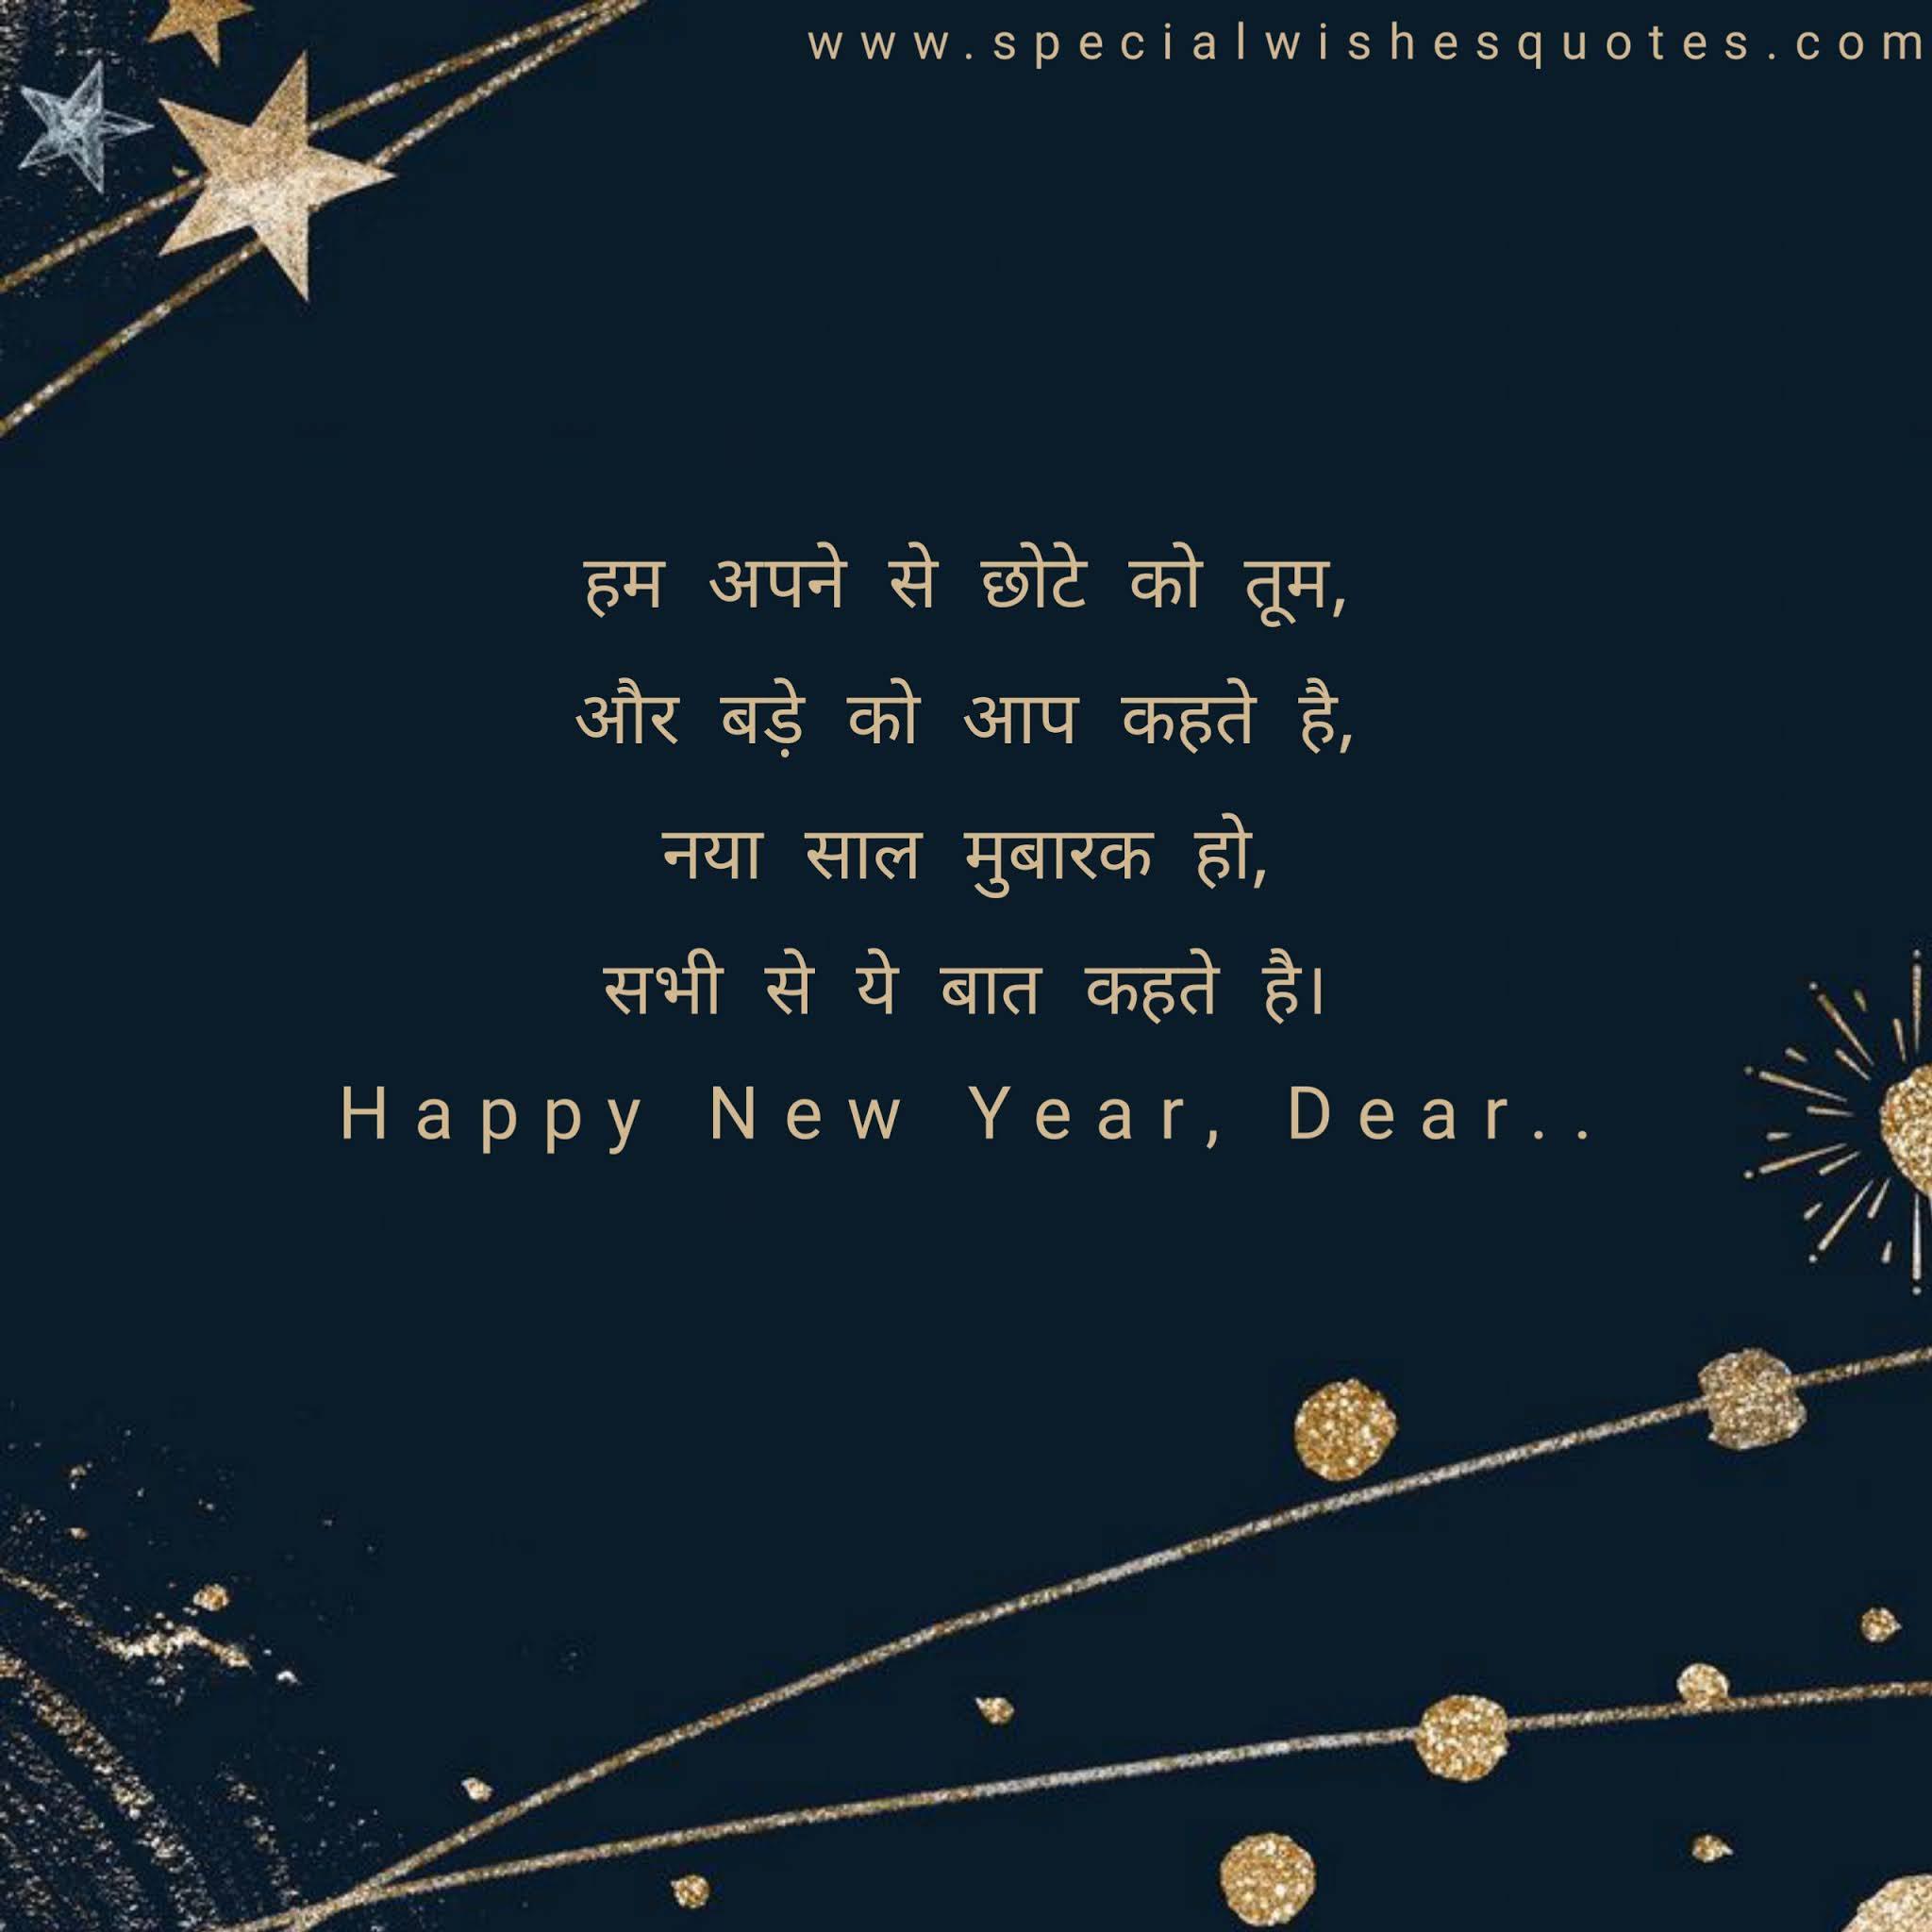 Happy New Year Shayari in Hindi for Friends and Family,